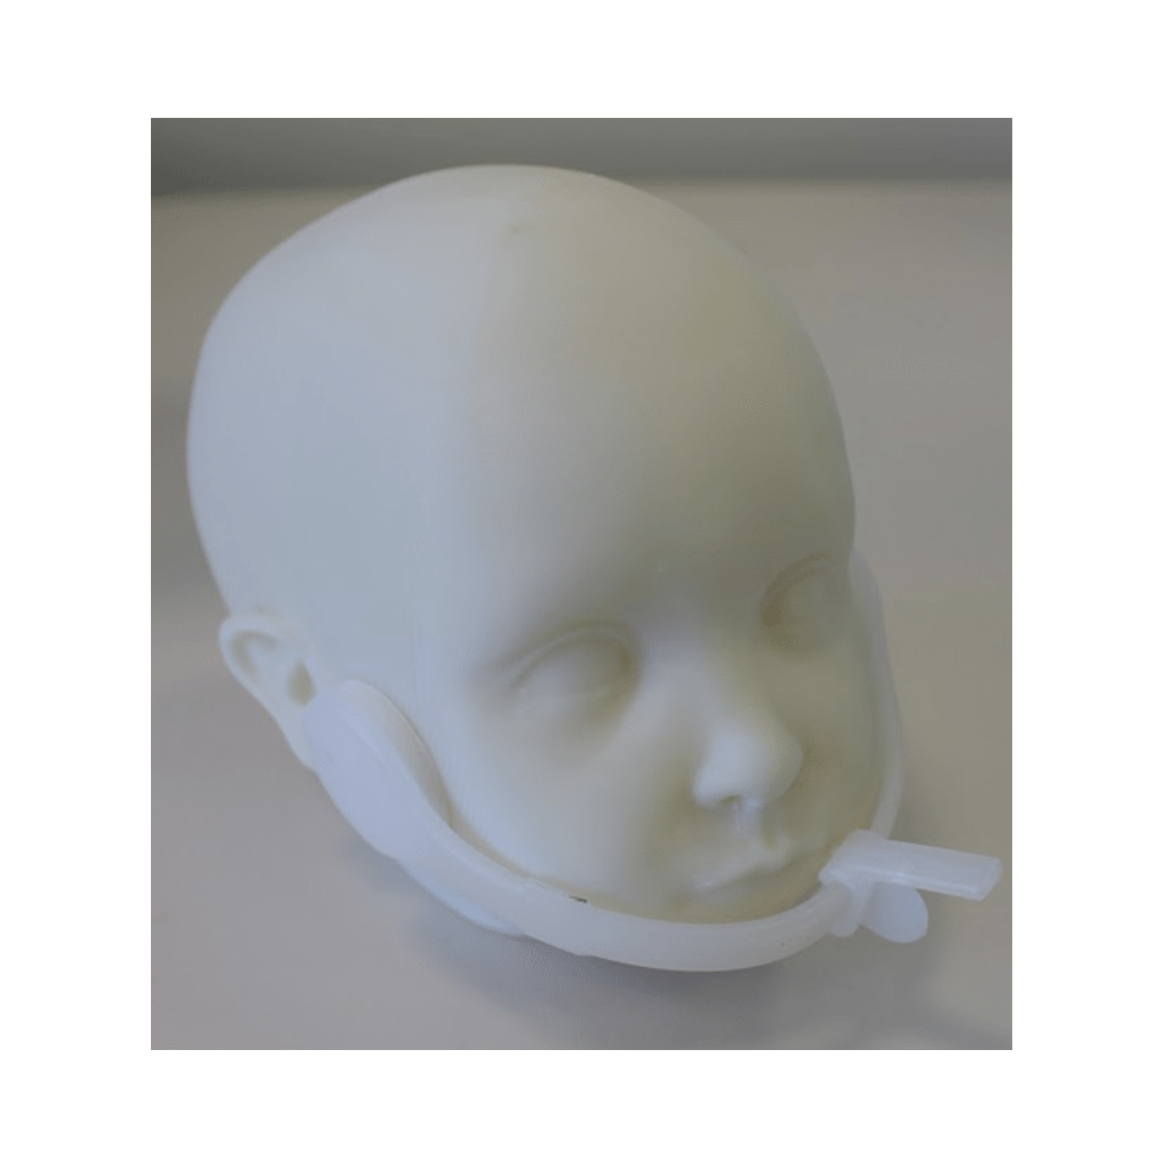 GSE Biomedical Endotracheal Tube Holder